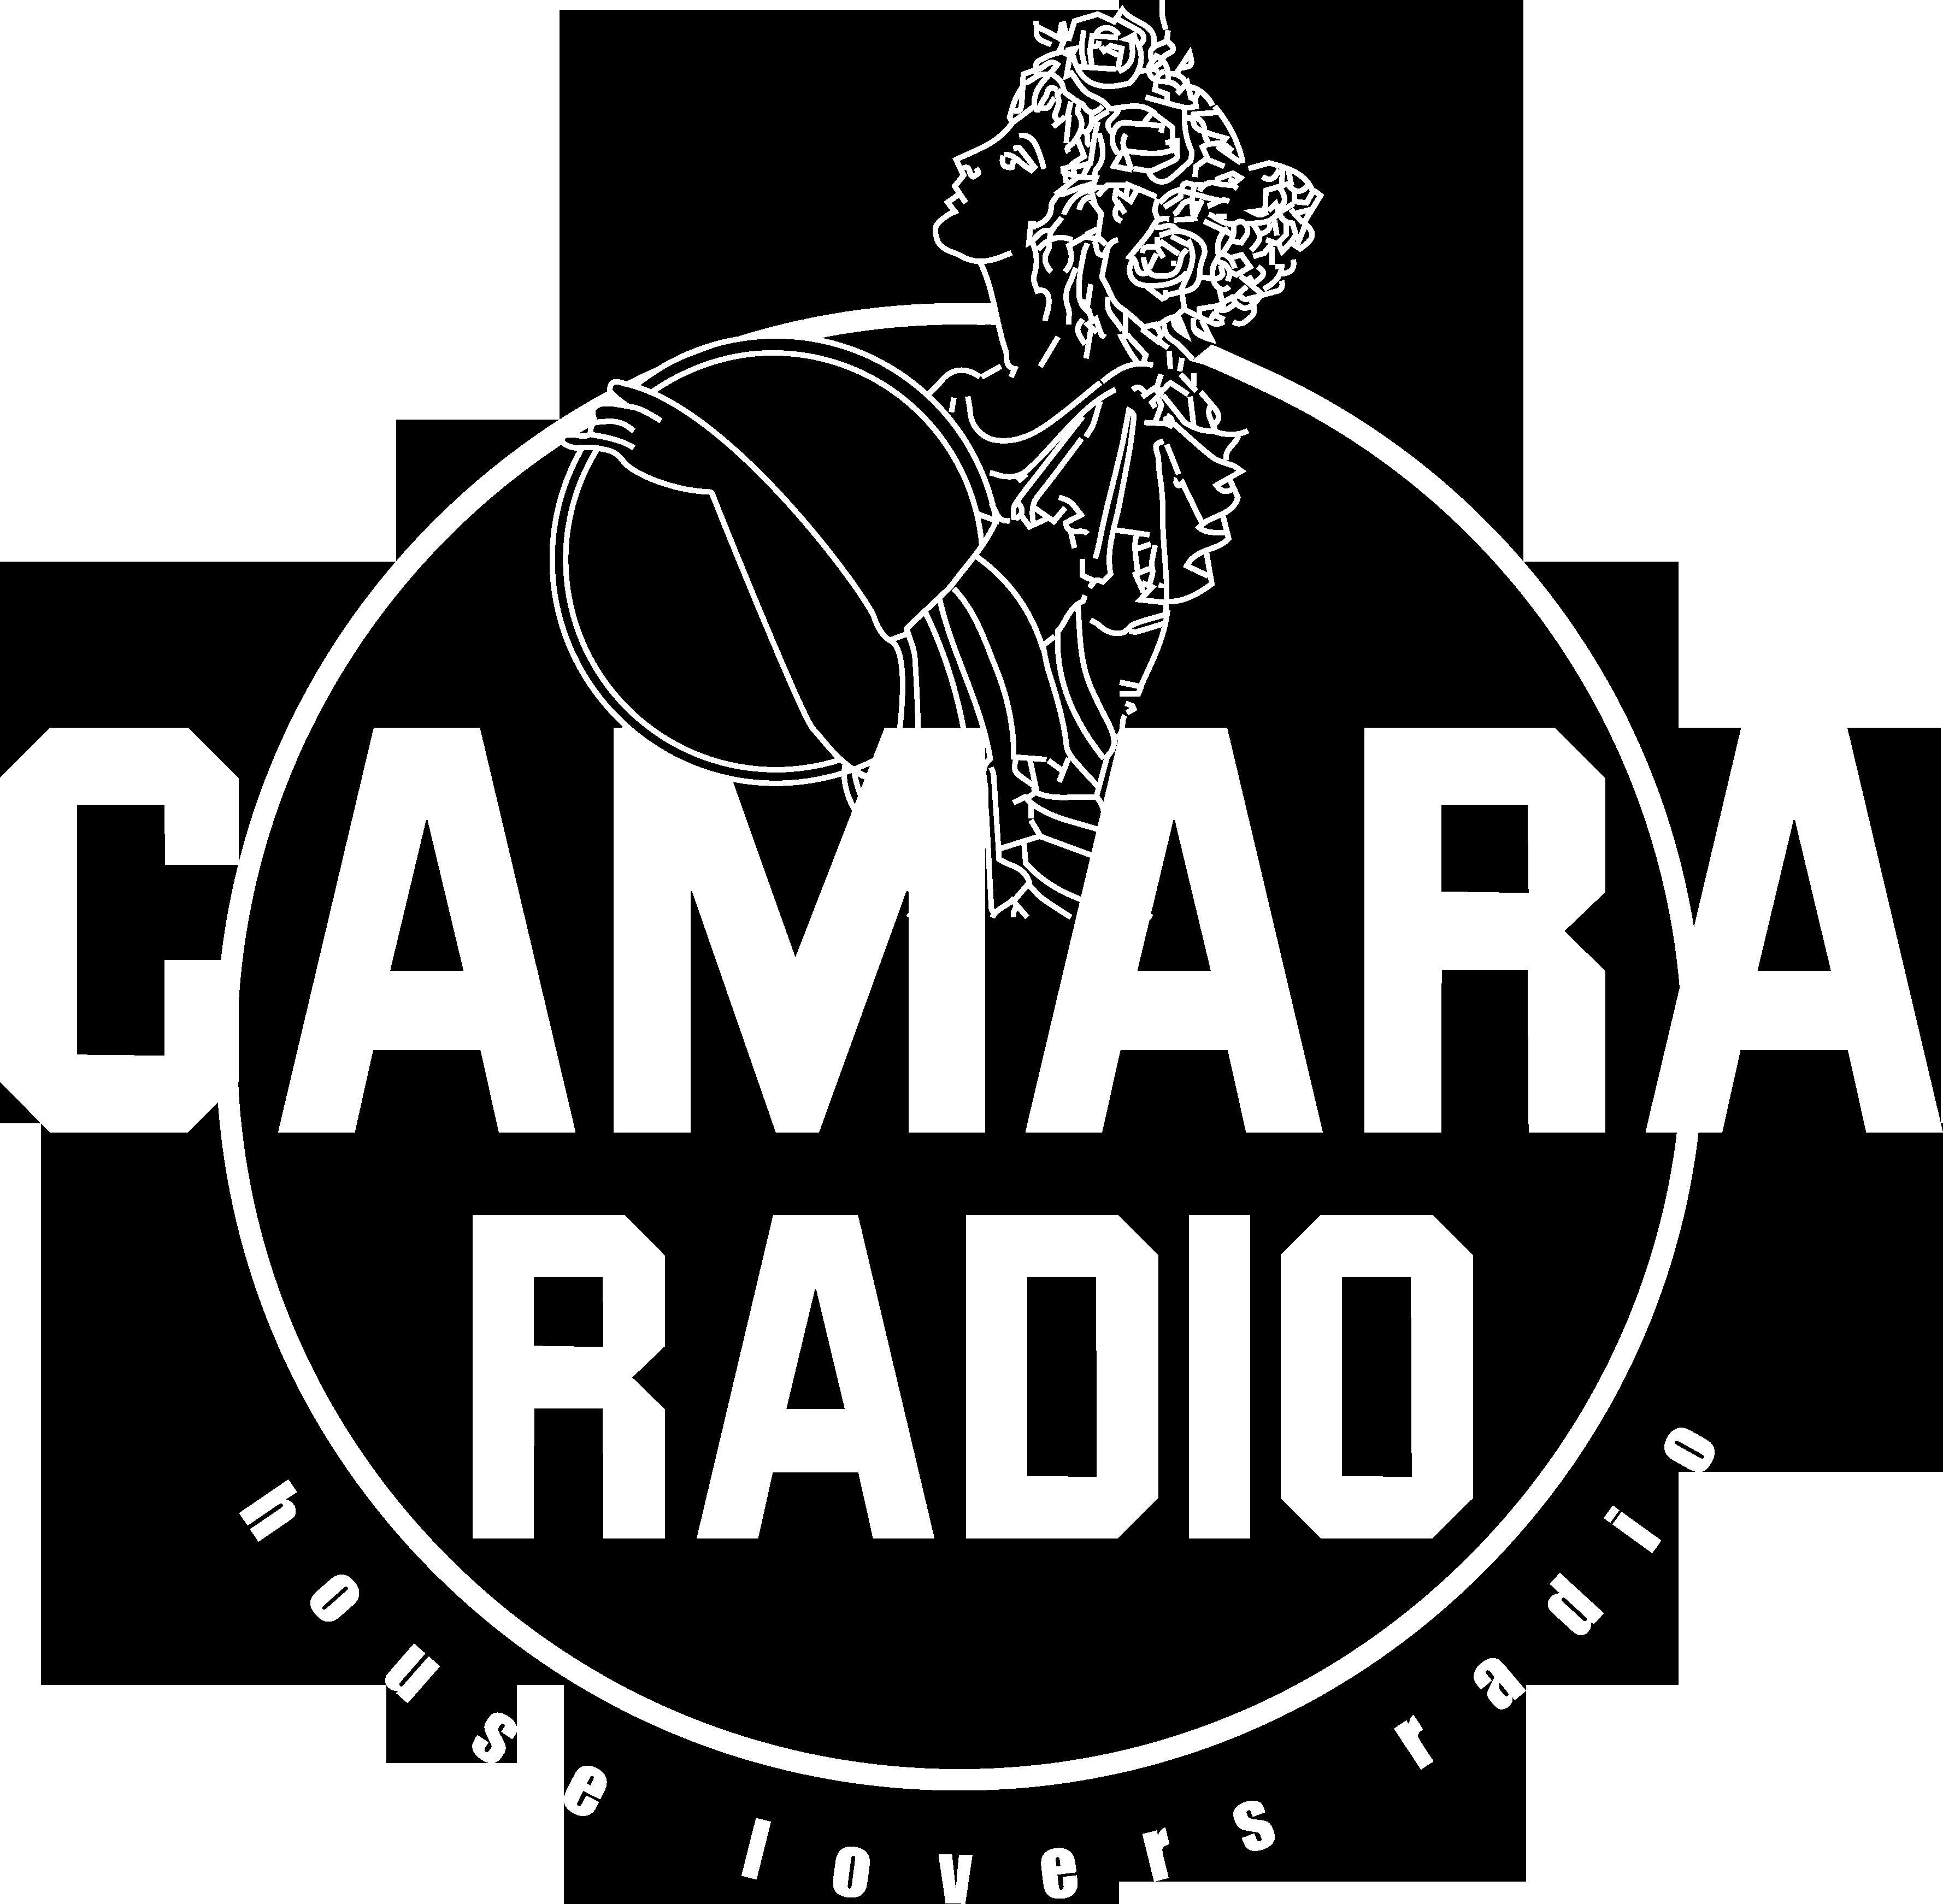 CAMARA RADIO